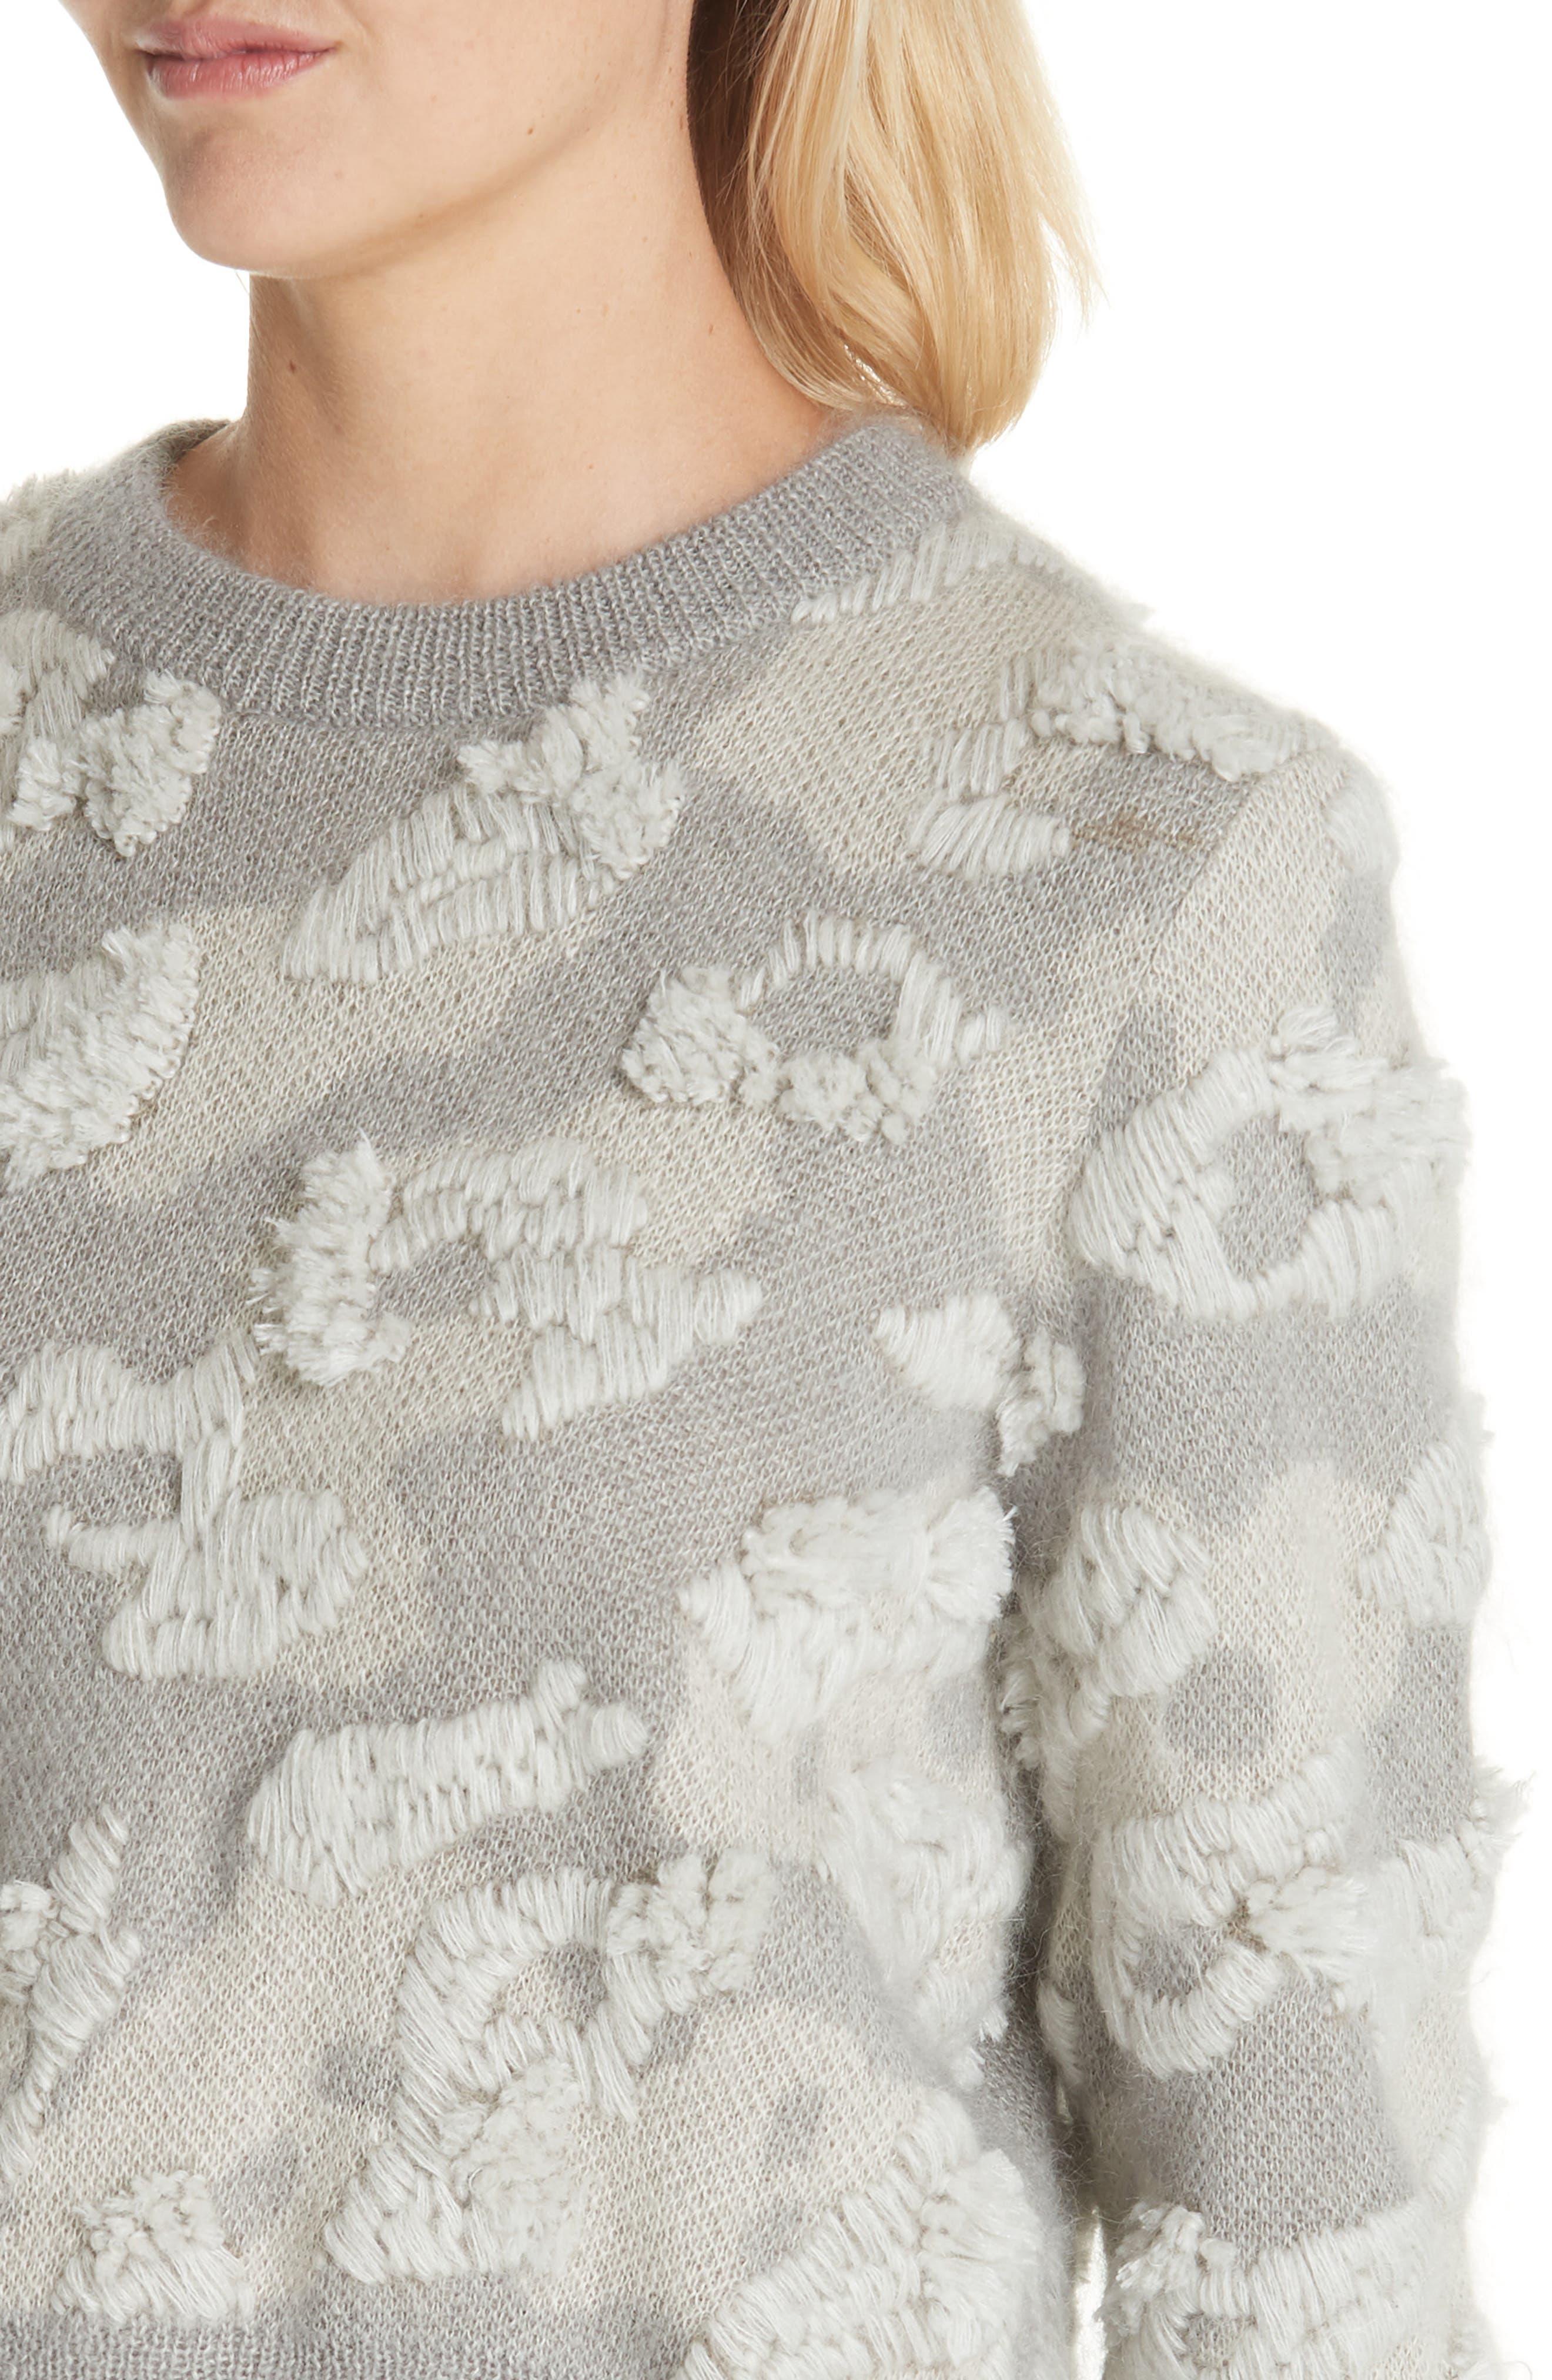 RAG & BONE,                             Embroidered Leopard Spot Sweater,                             Alternate thumbnail 4, color,                             900